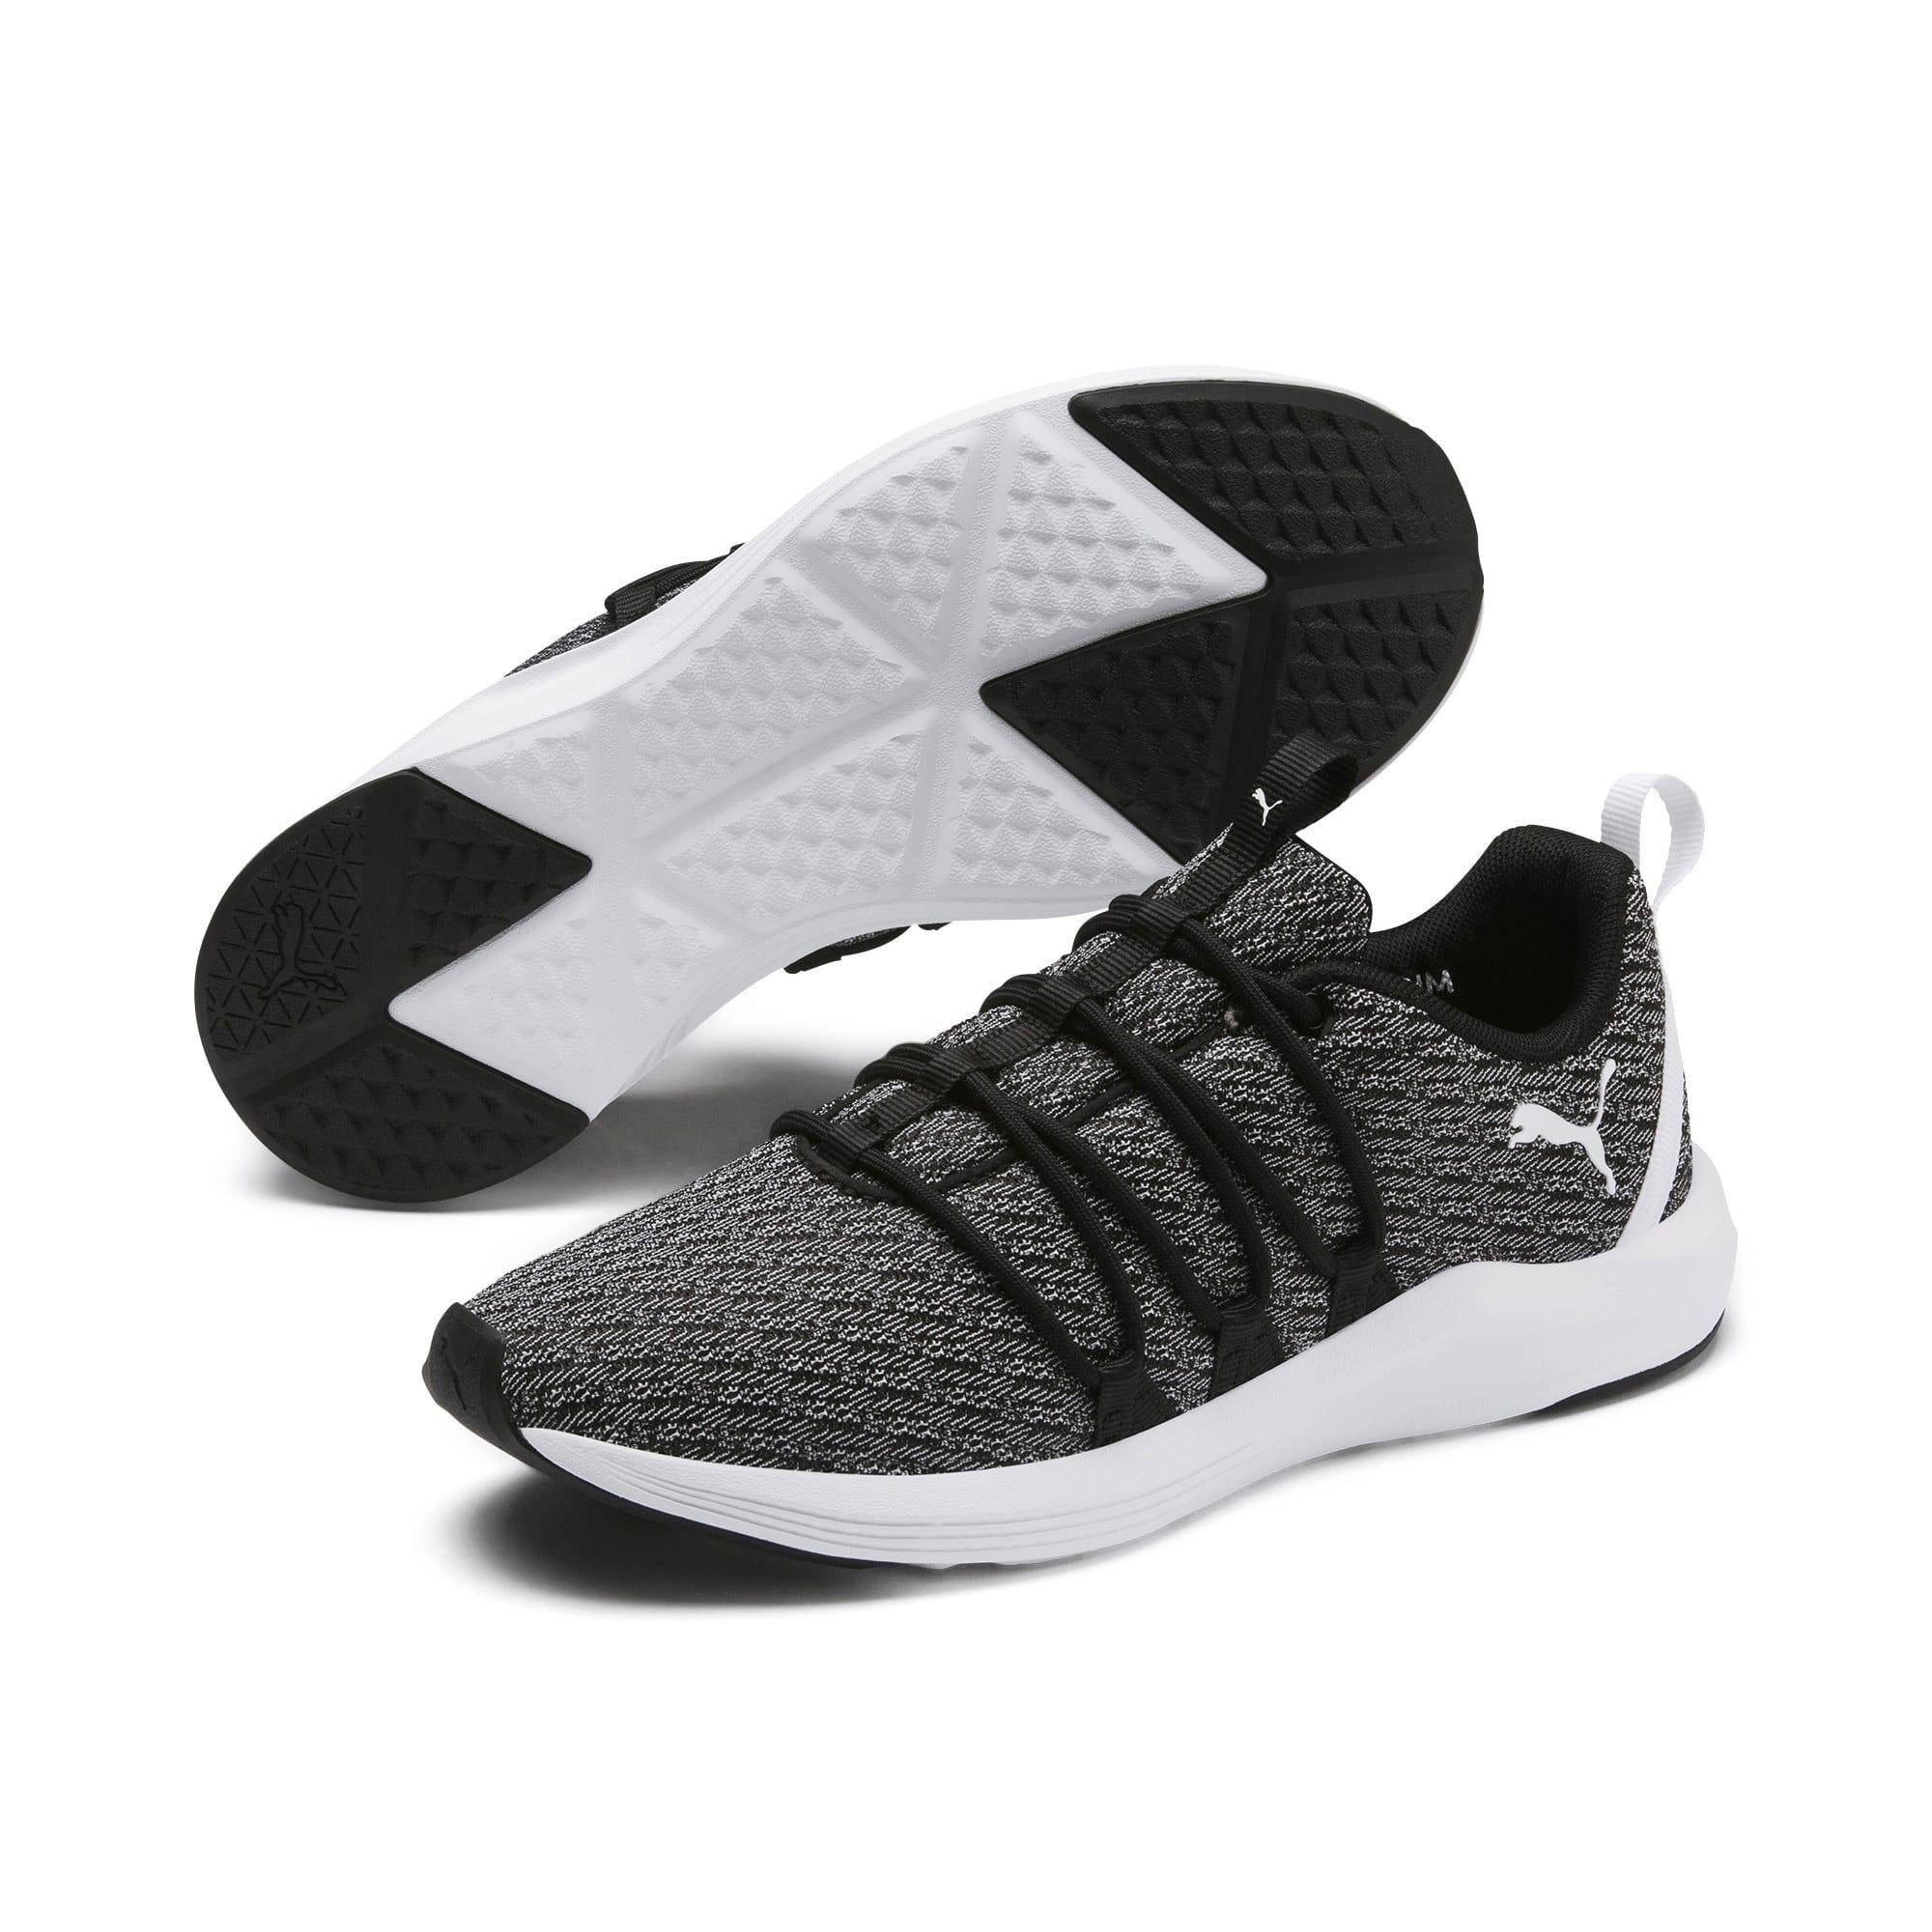 Thumbnail 3 of Prowl Alt Neon Women's Training Shoes, Puma Black-Puma White, medium